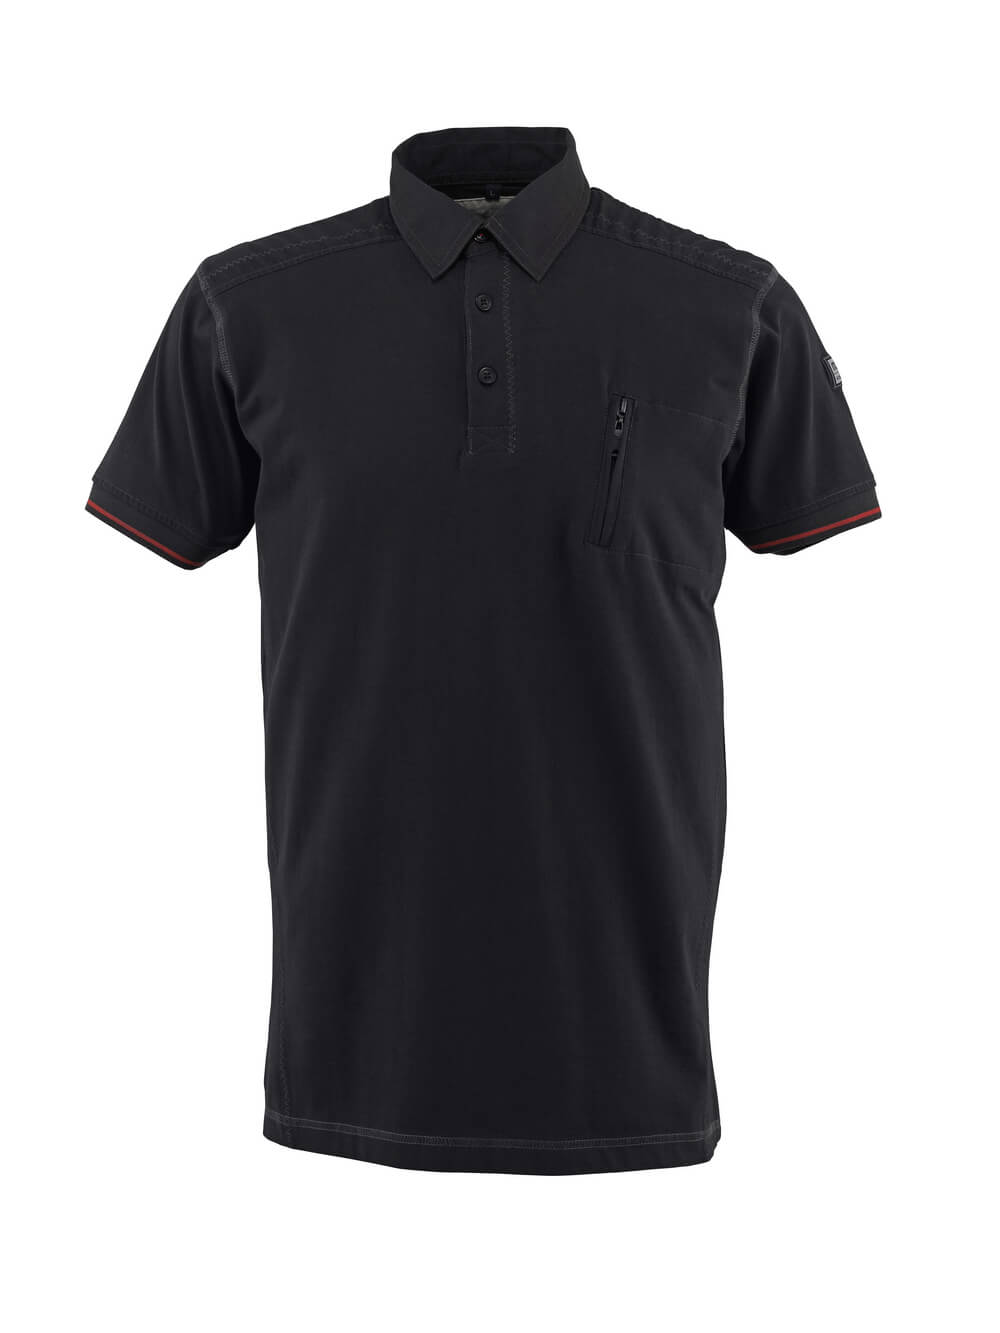 50351-833-09 Poloshirt met borstzak - zwart